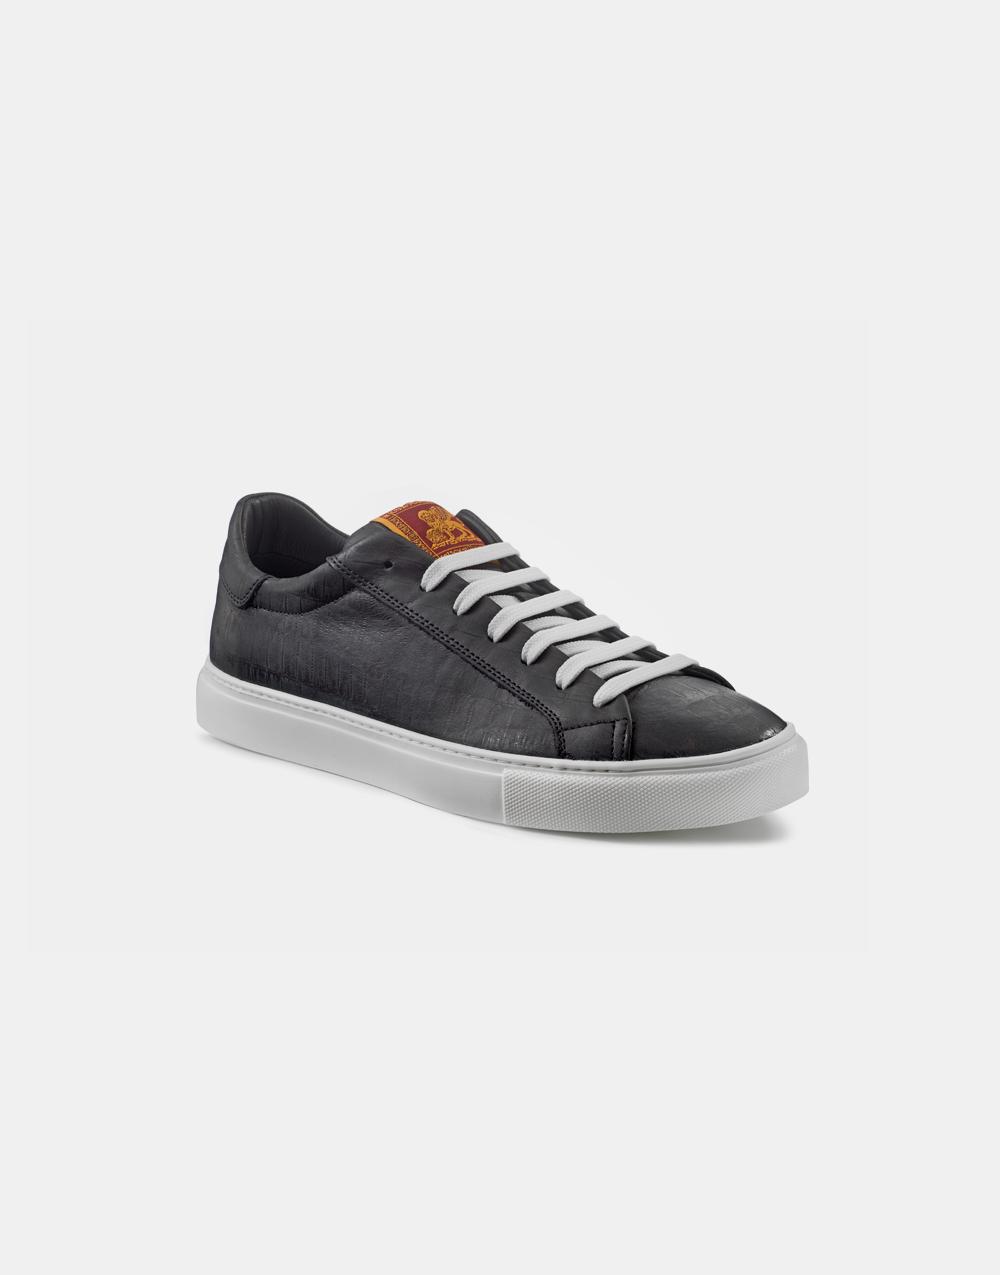 sneakers-veneto-doc-nera-texture-bassa